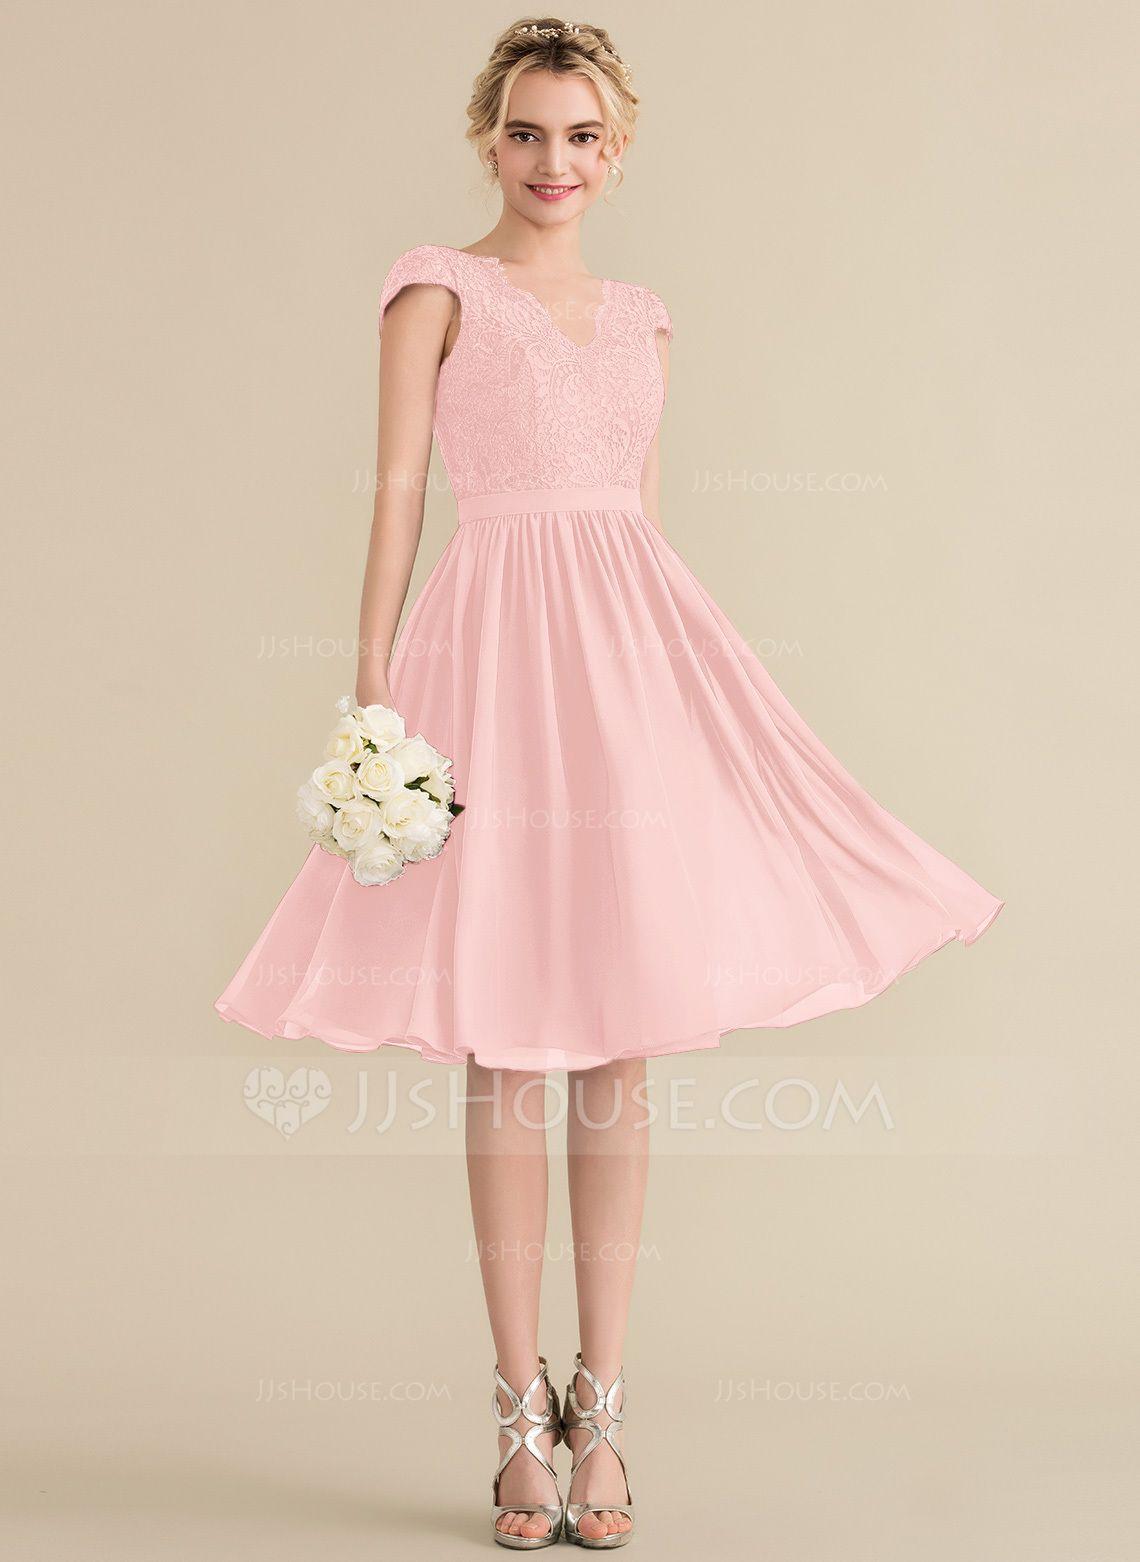 4663834ae5ef1 A-Line/Princess V-neck Knee-Length Chiffon Lace Bridesmaid Dress  (007144774) - Bridesmaid Dresses - JJ's House